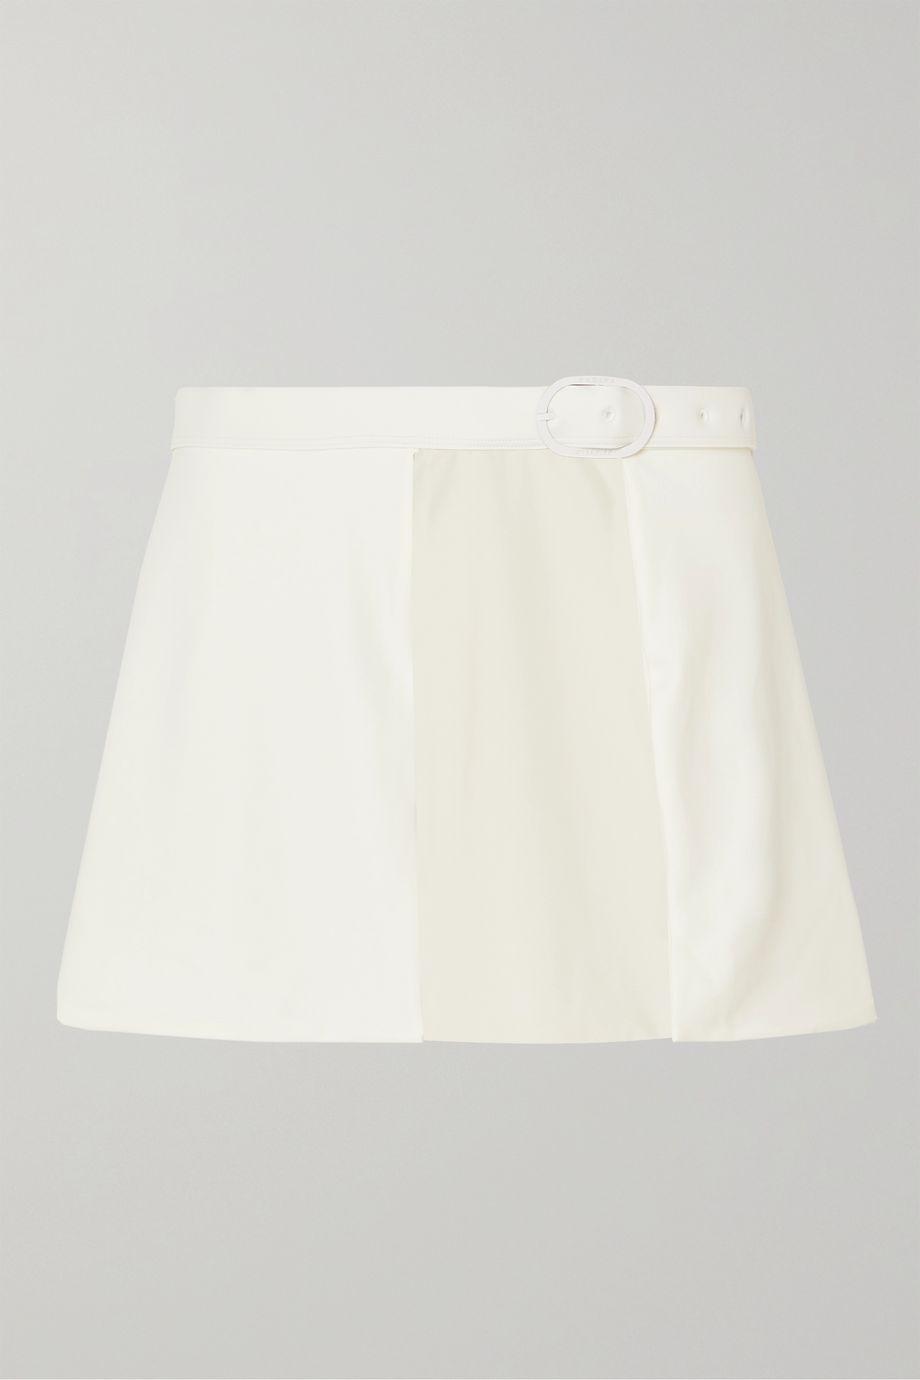 unknown Calypso buckled swim skirt